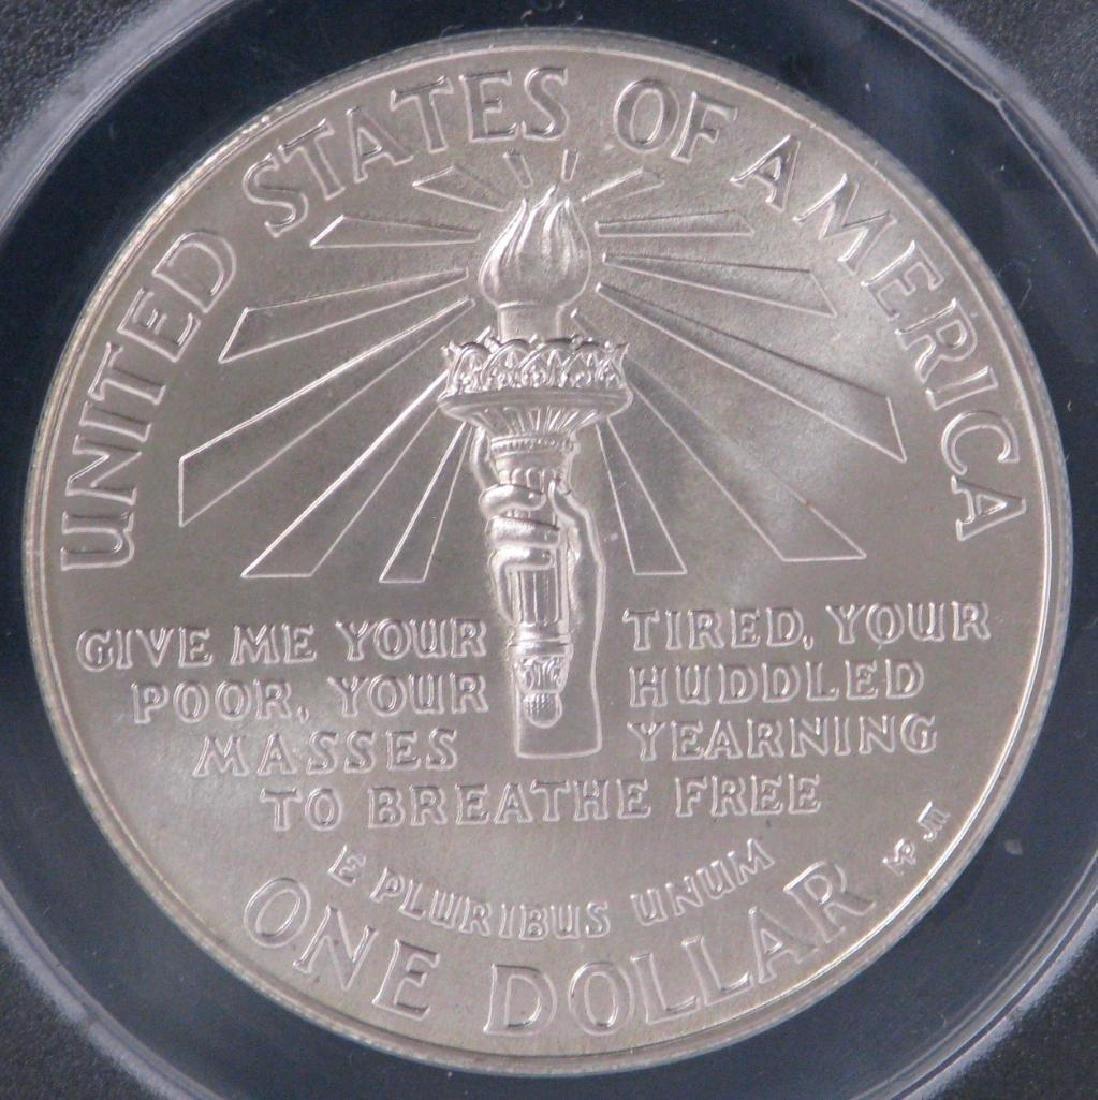 1986-P Statue of Liberty Centennial Commemorative CoinÊ - 4